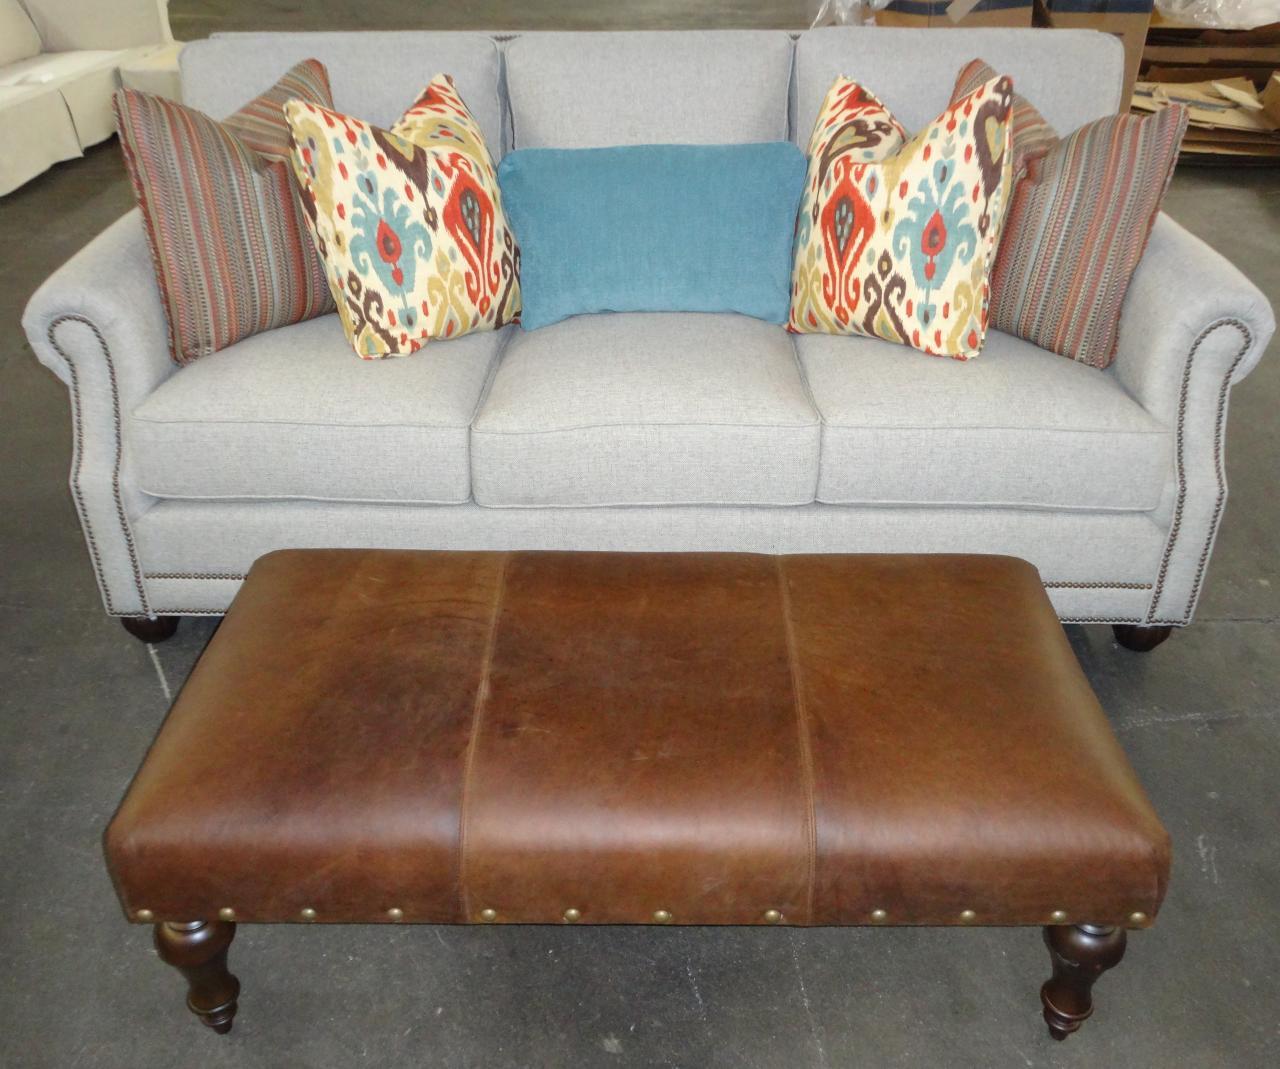 Barnett Furniture King Hickory Julianna